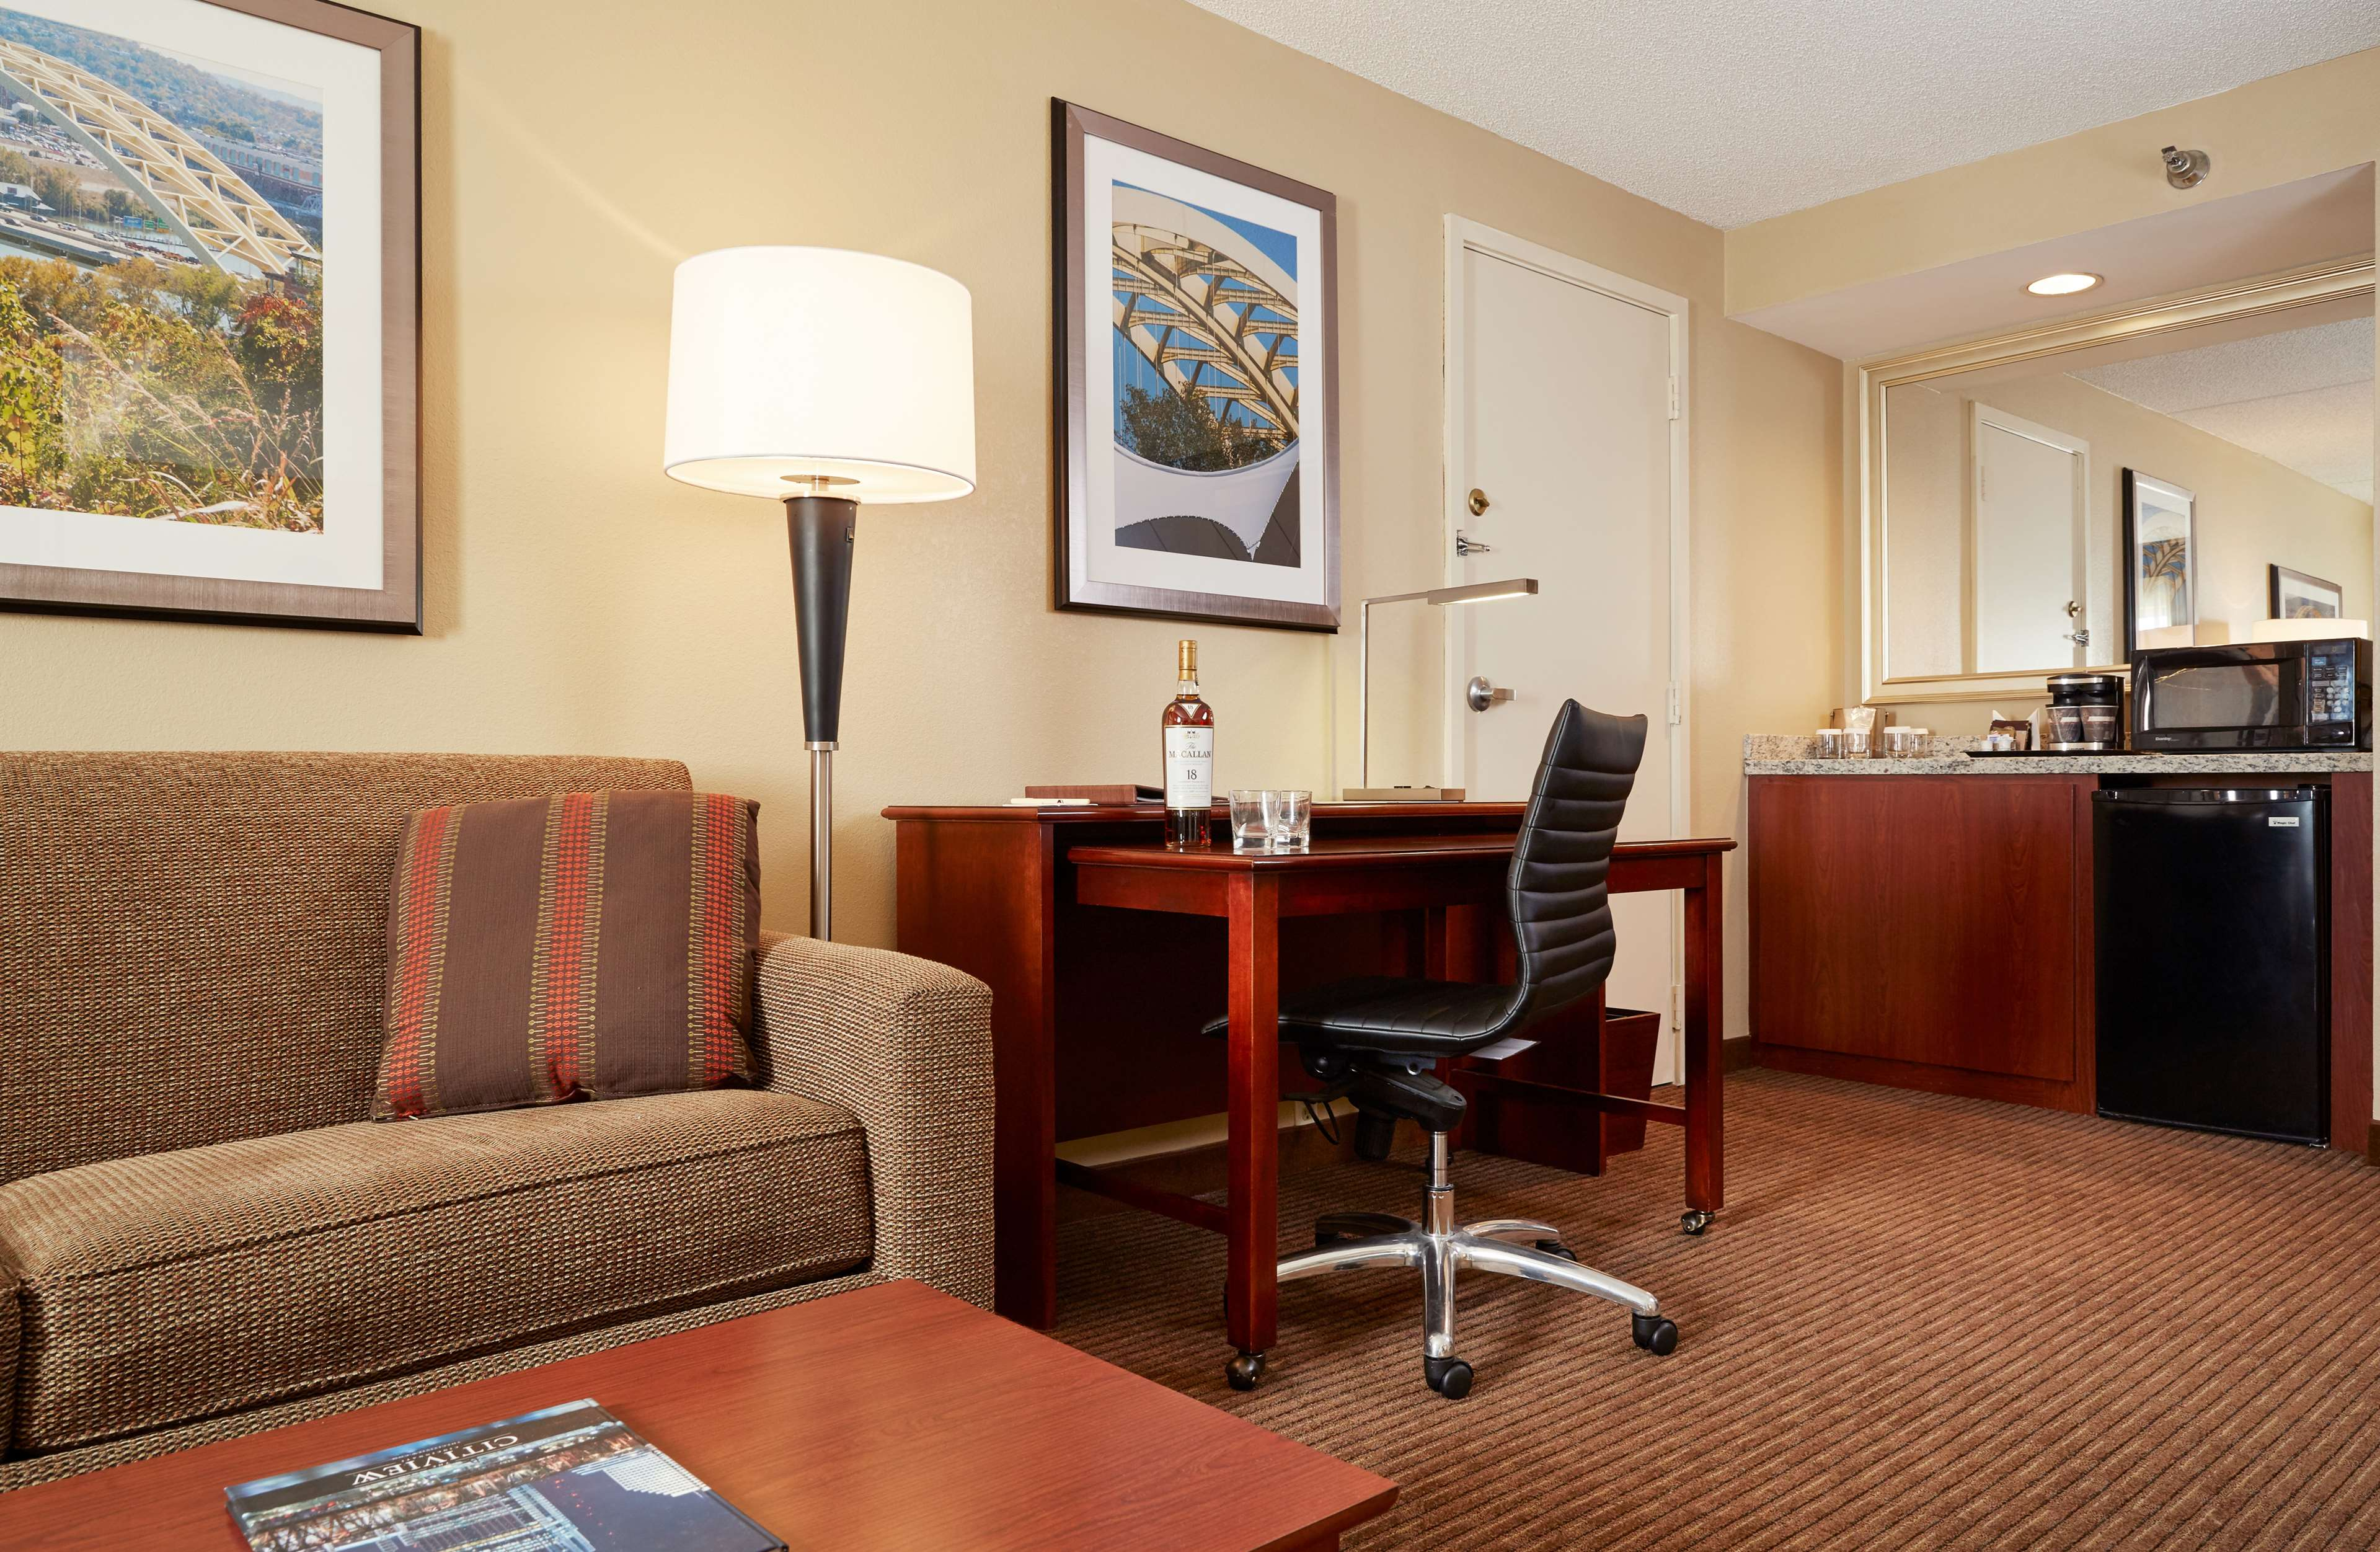 DoubleTree Suites by Hilton Hotel Cincinnati - Blue Ash image 8